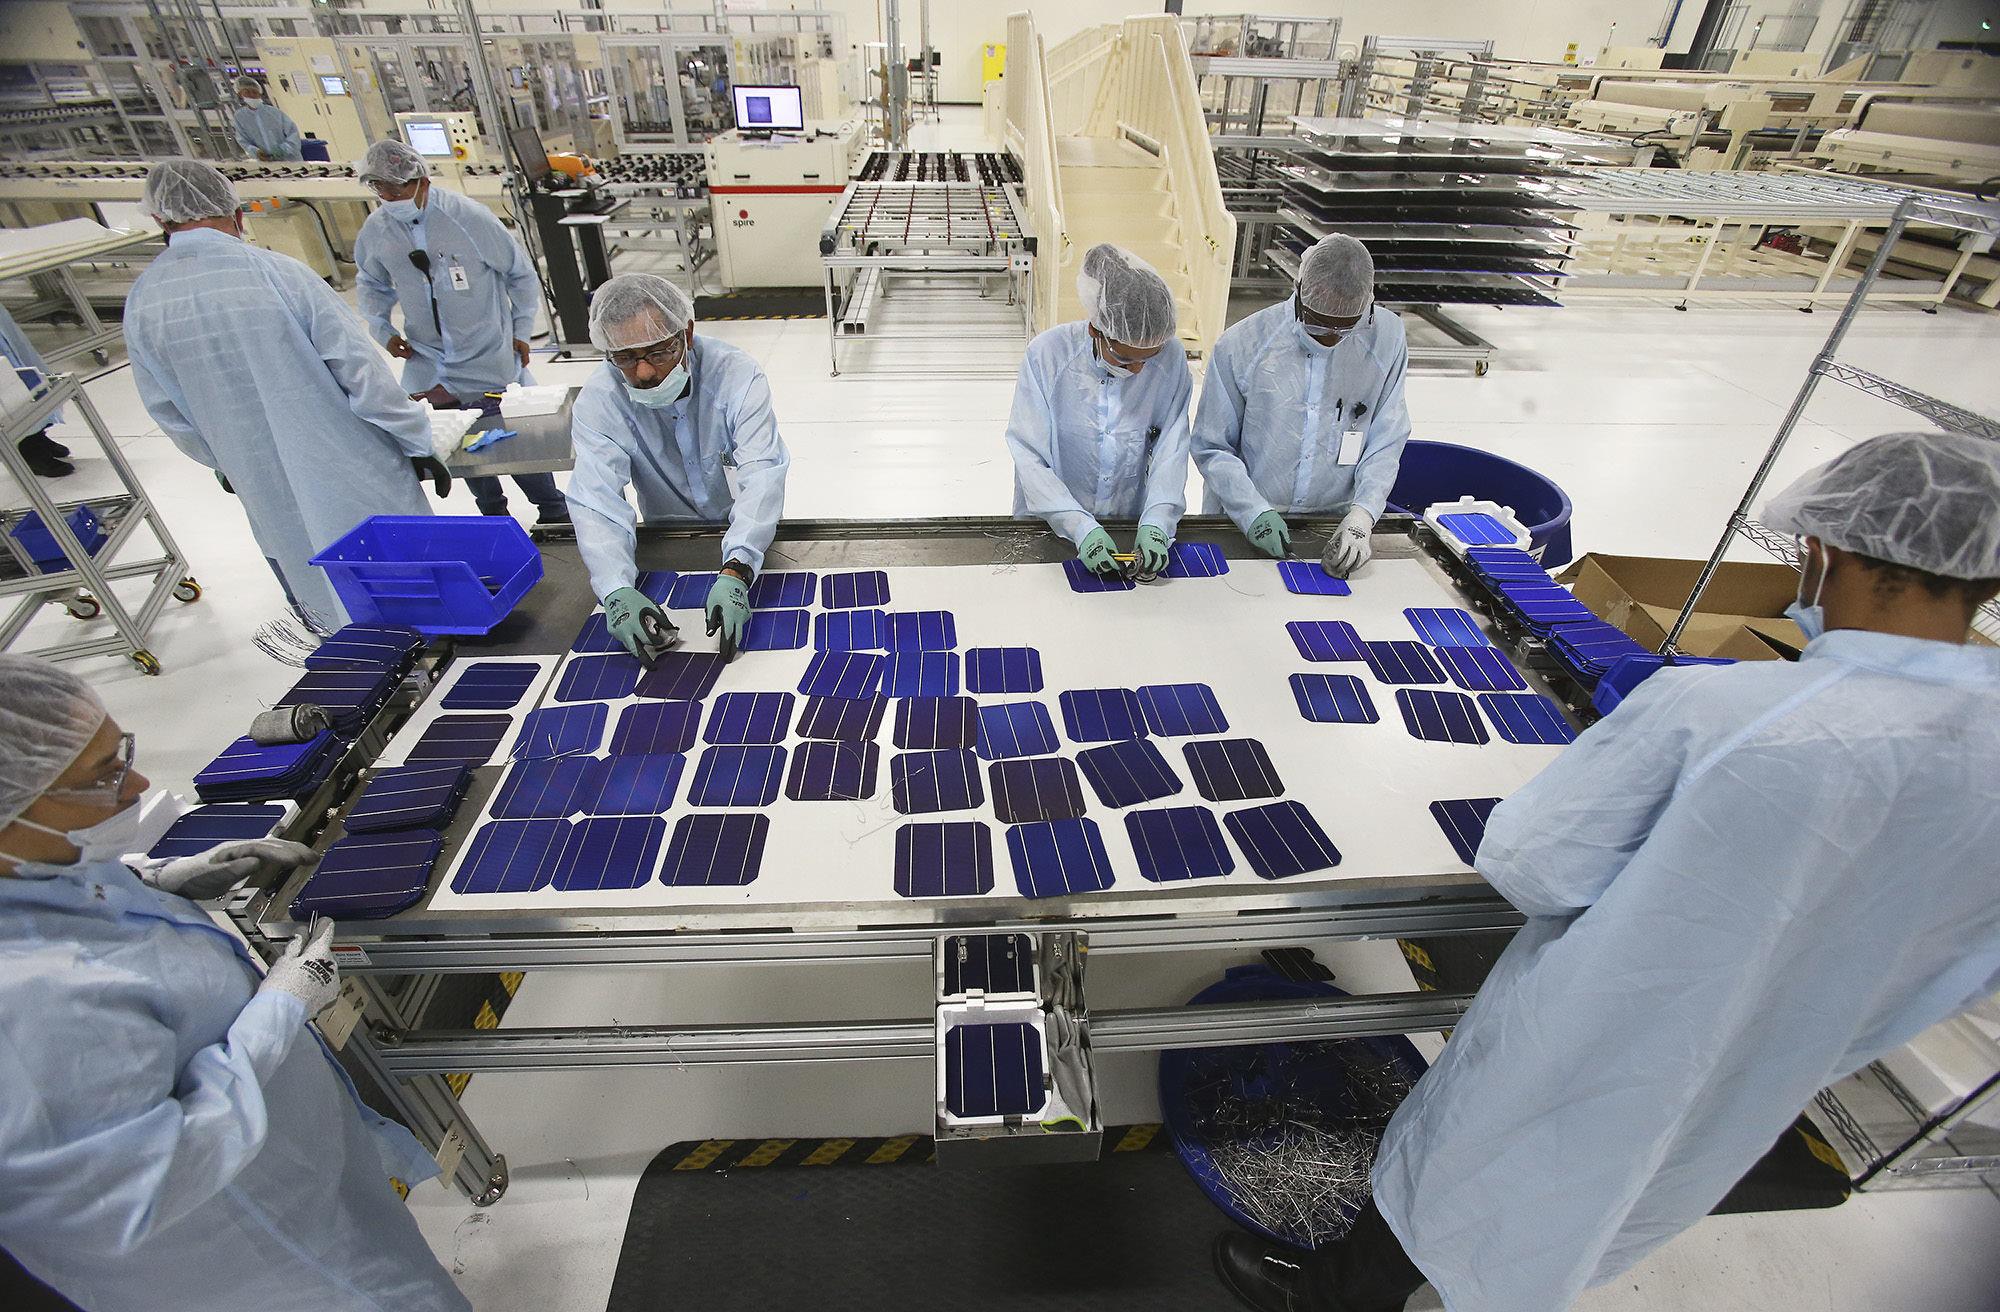 Solar panel price hikes threaten the Paris Agreement – study